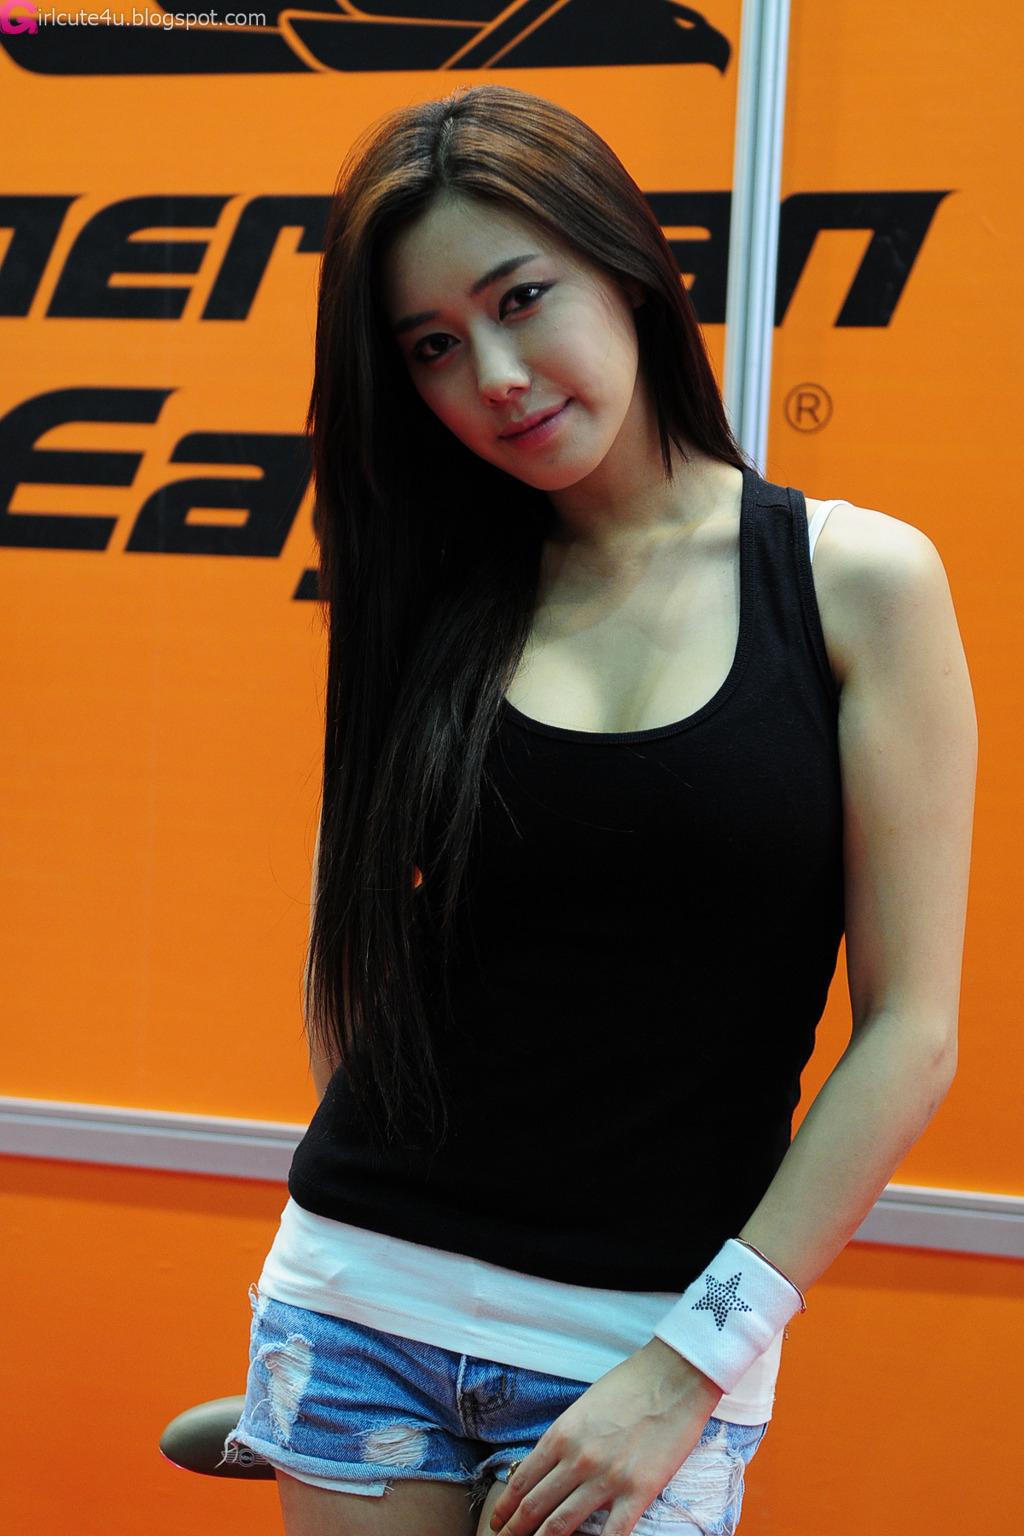 xxx nude girls: Kim Ha Yul - KSRC R1 2012